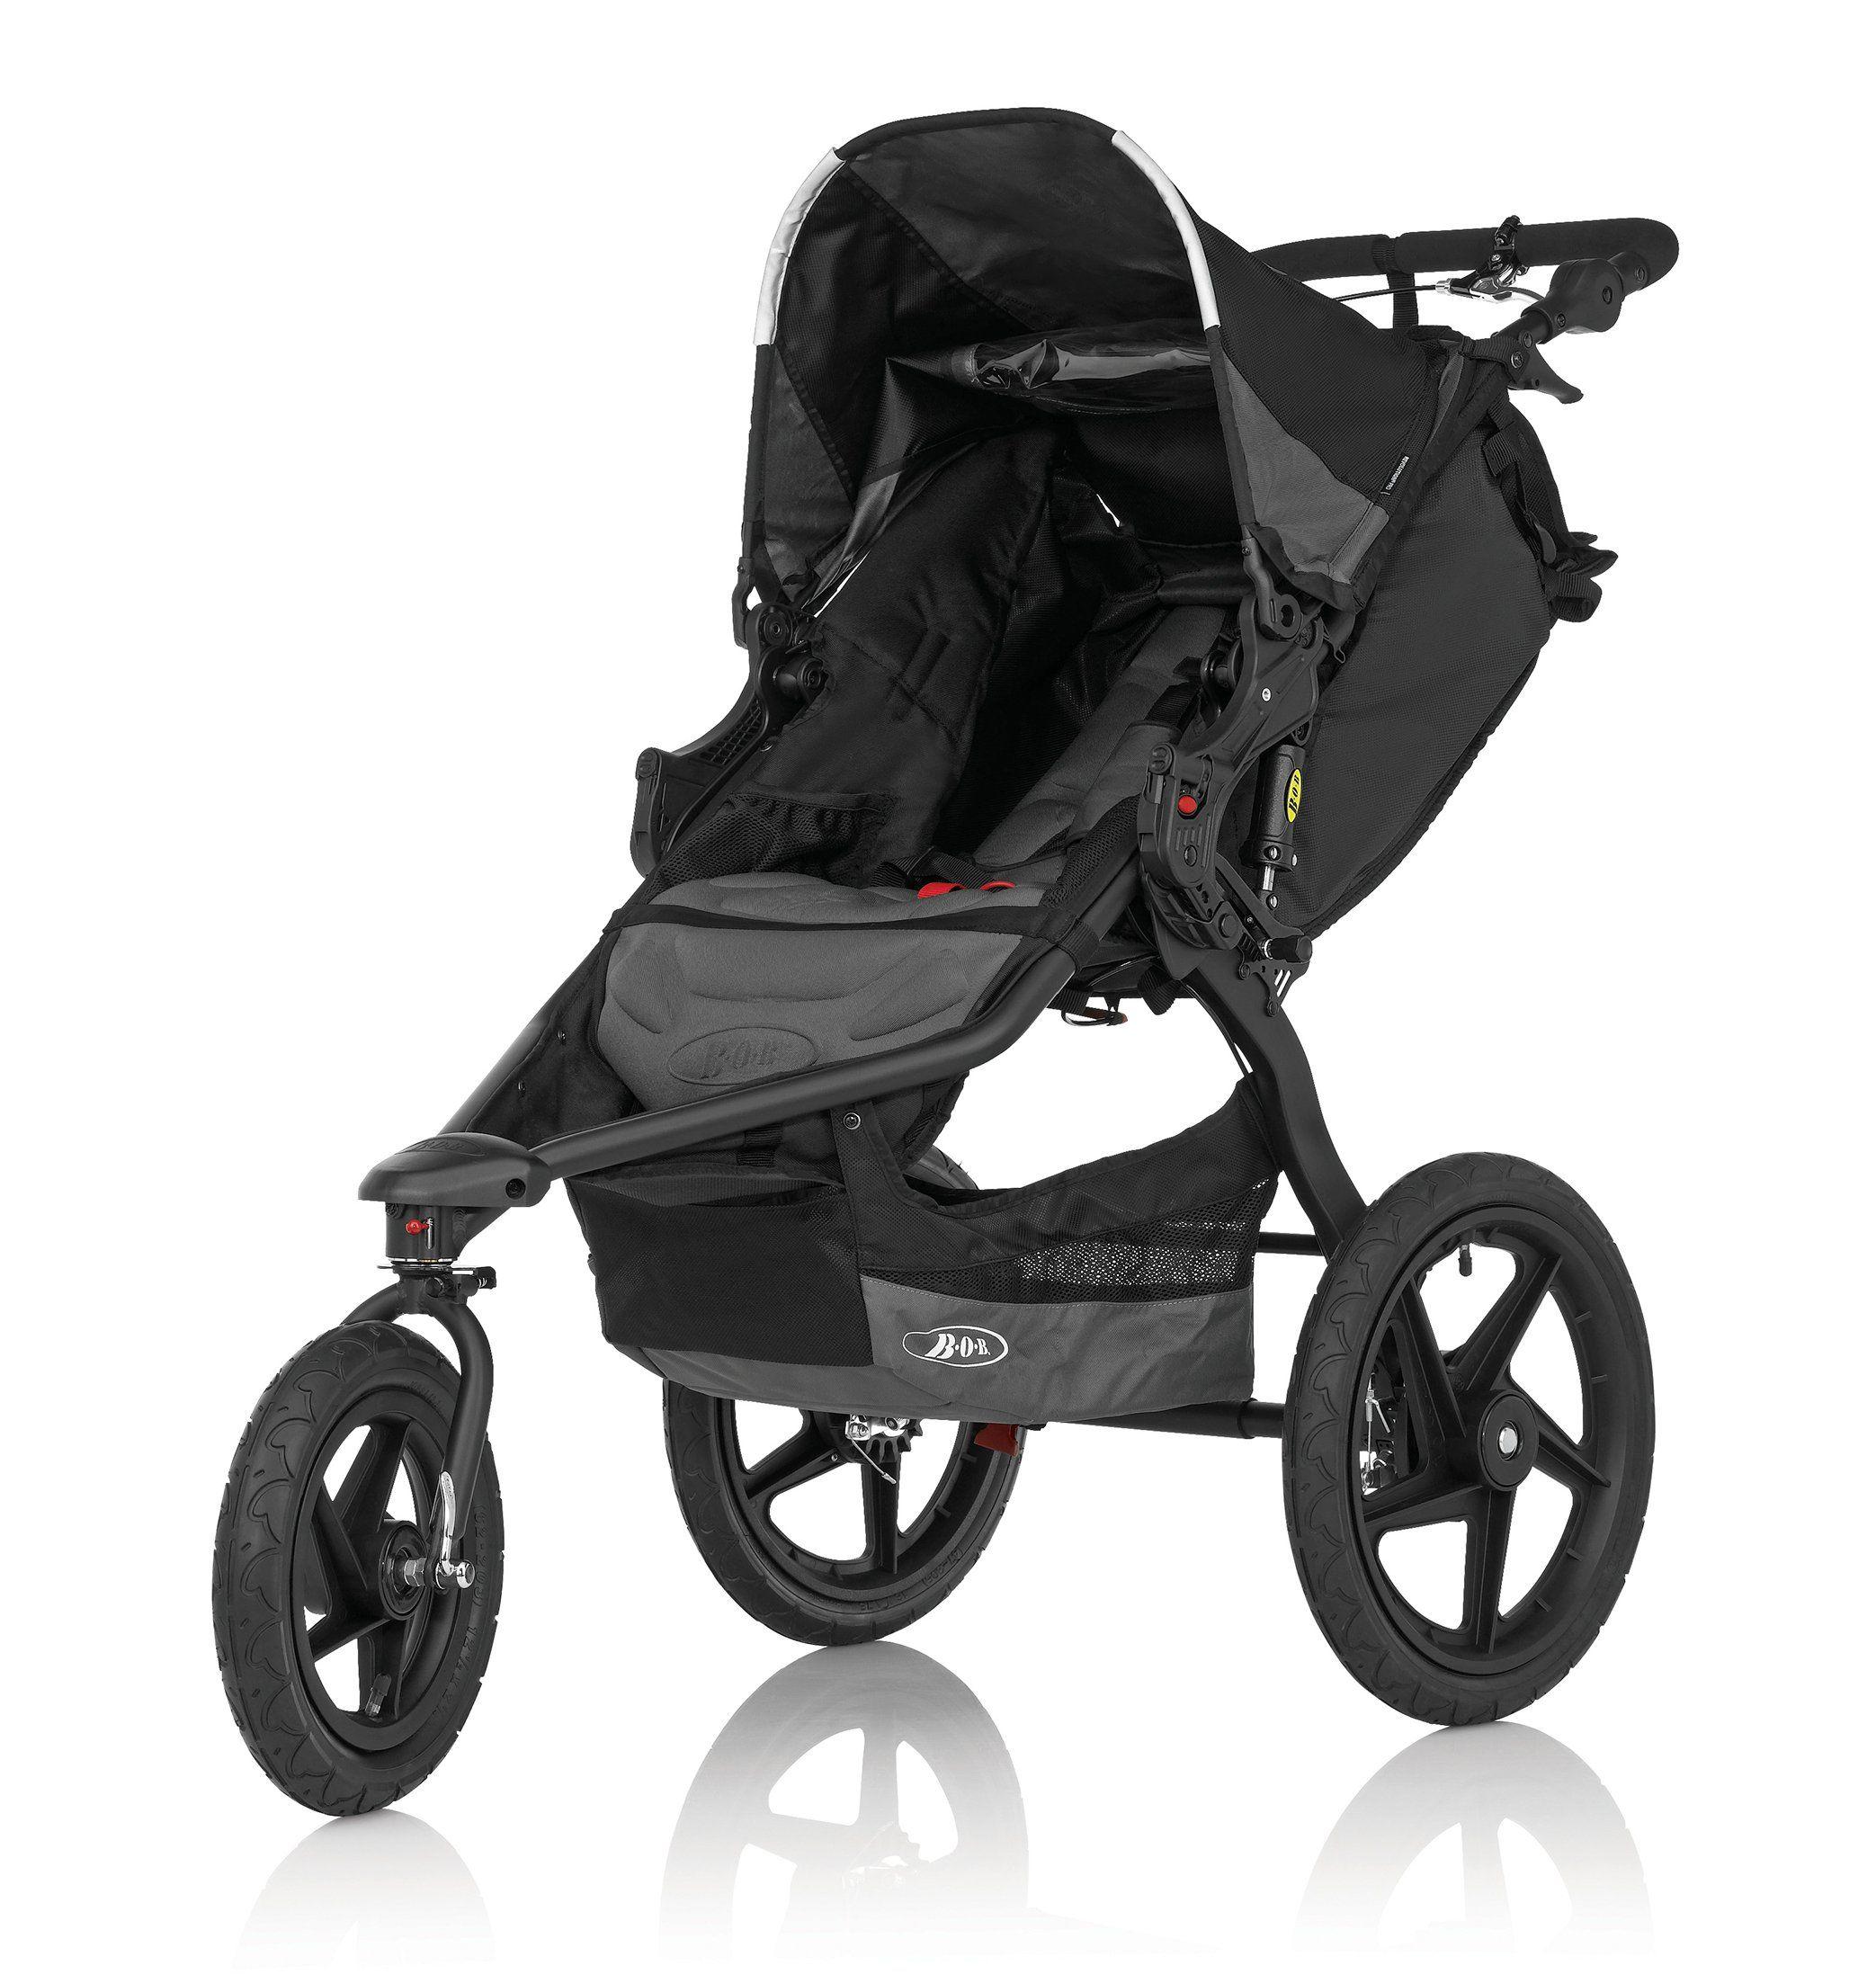 Shop Bob stroller, Stroller, Pushchair